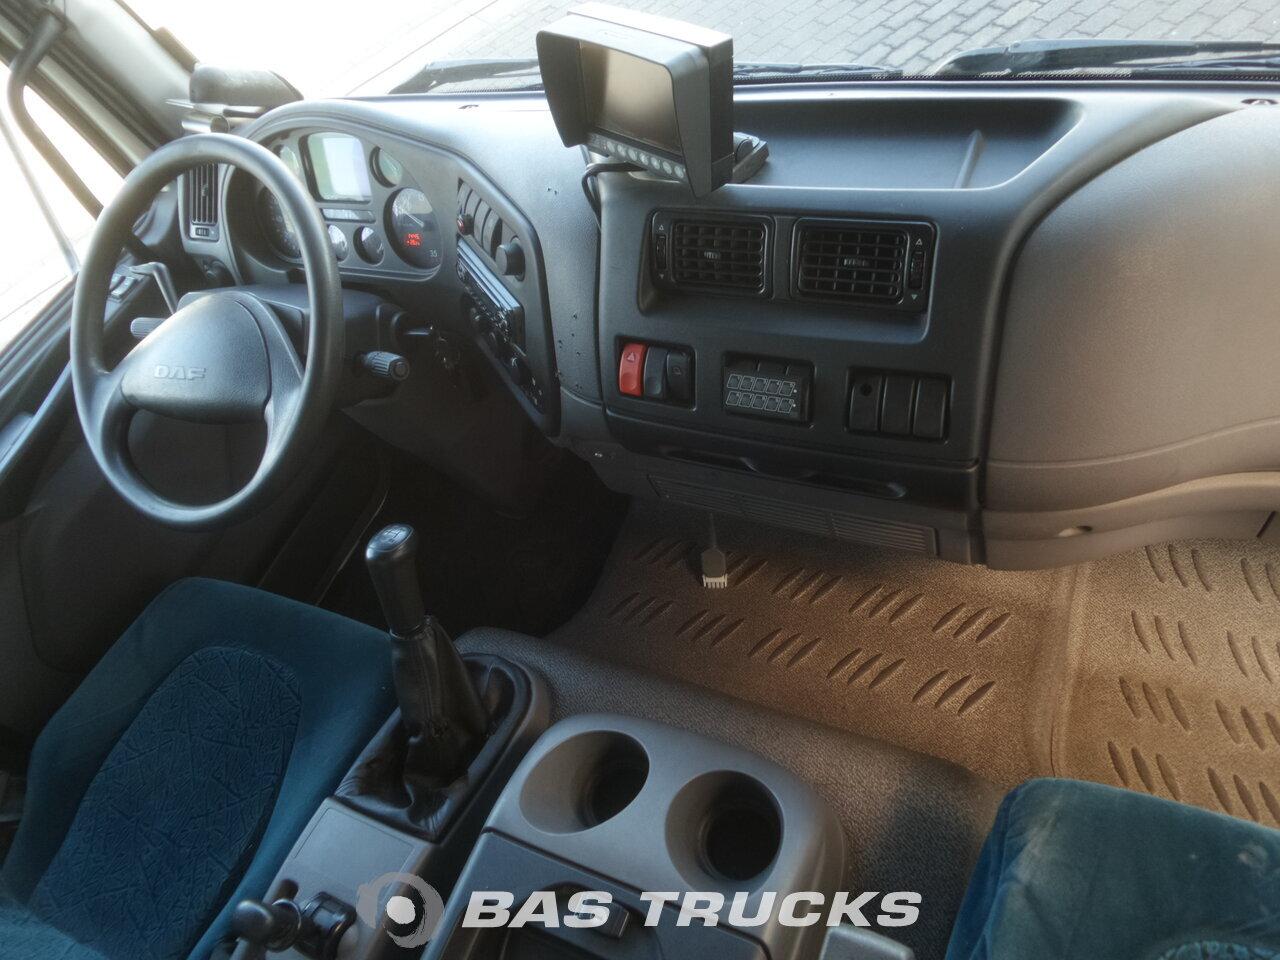 photo de Occasion Camion DAF LF45.150 4X2 2002